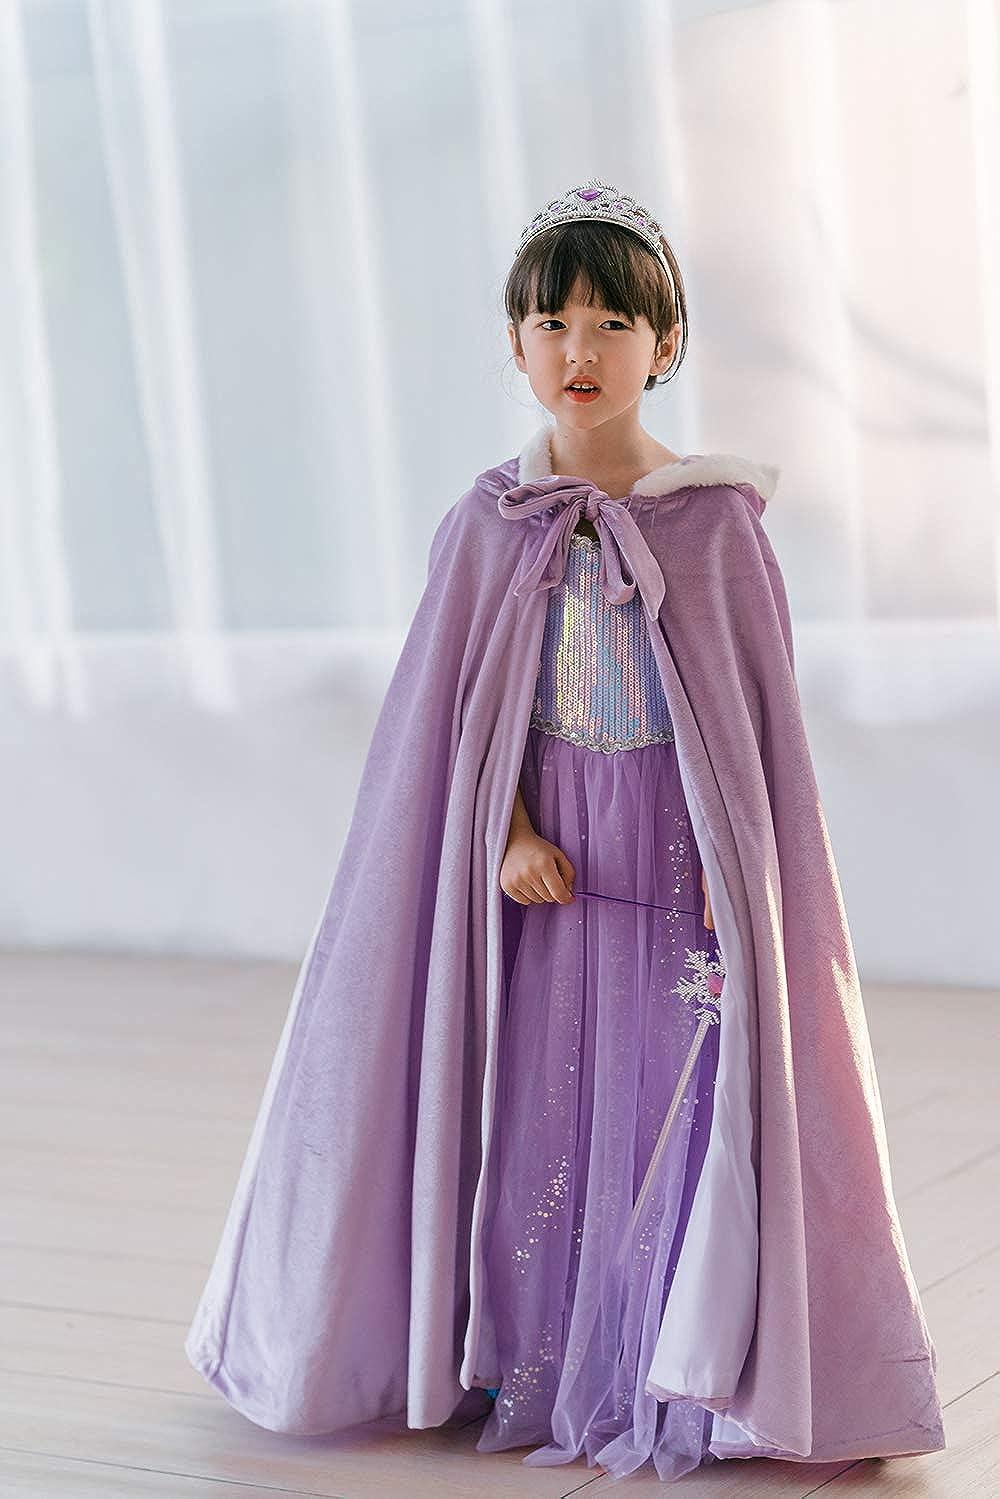 Party Umhang f/ür Halloween lang Wintermantel Cosplay yeesn M/ädchen Prinzessin ELSA Samt-Kapuze